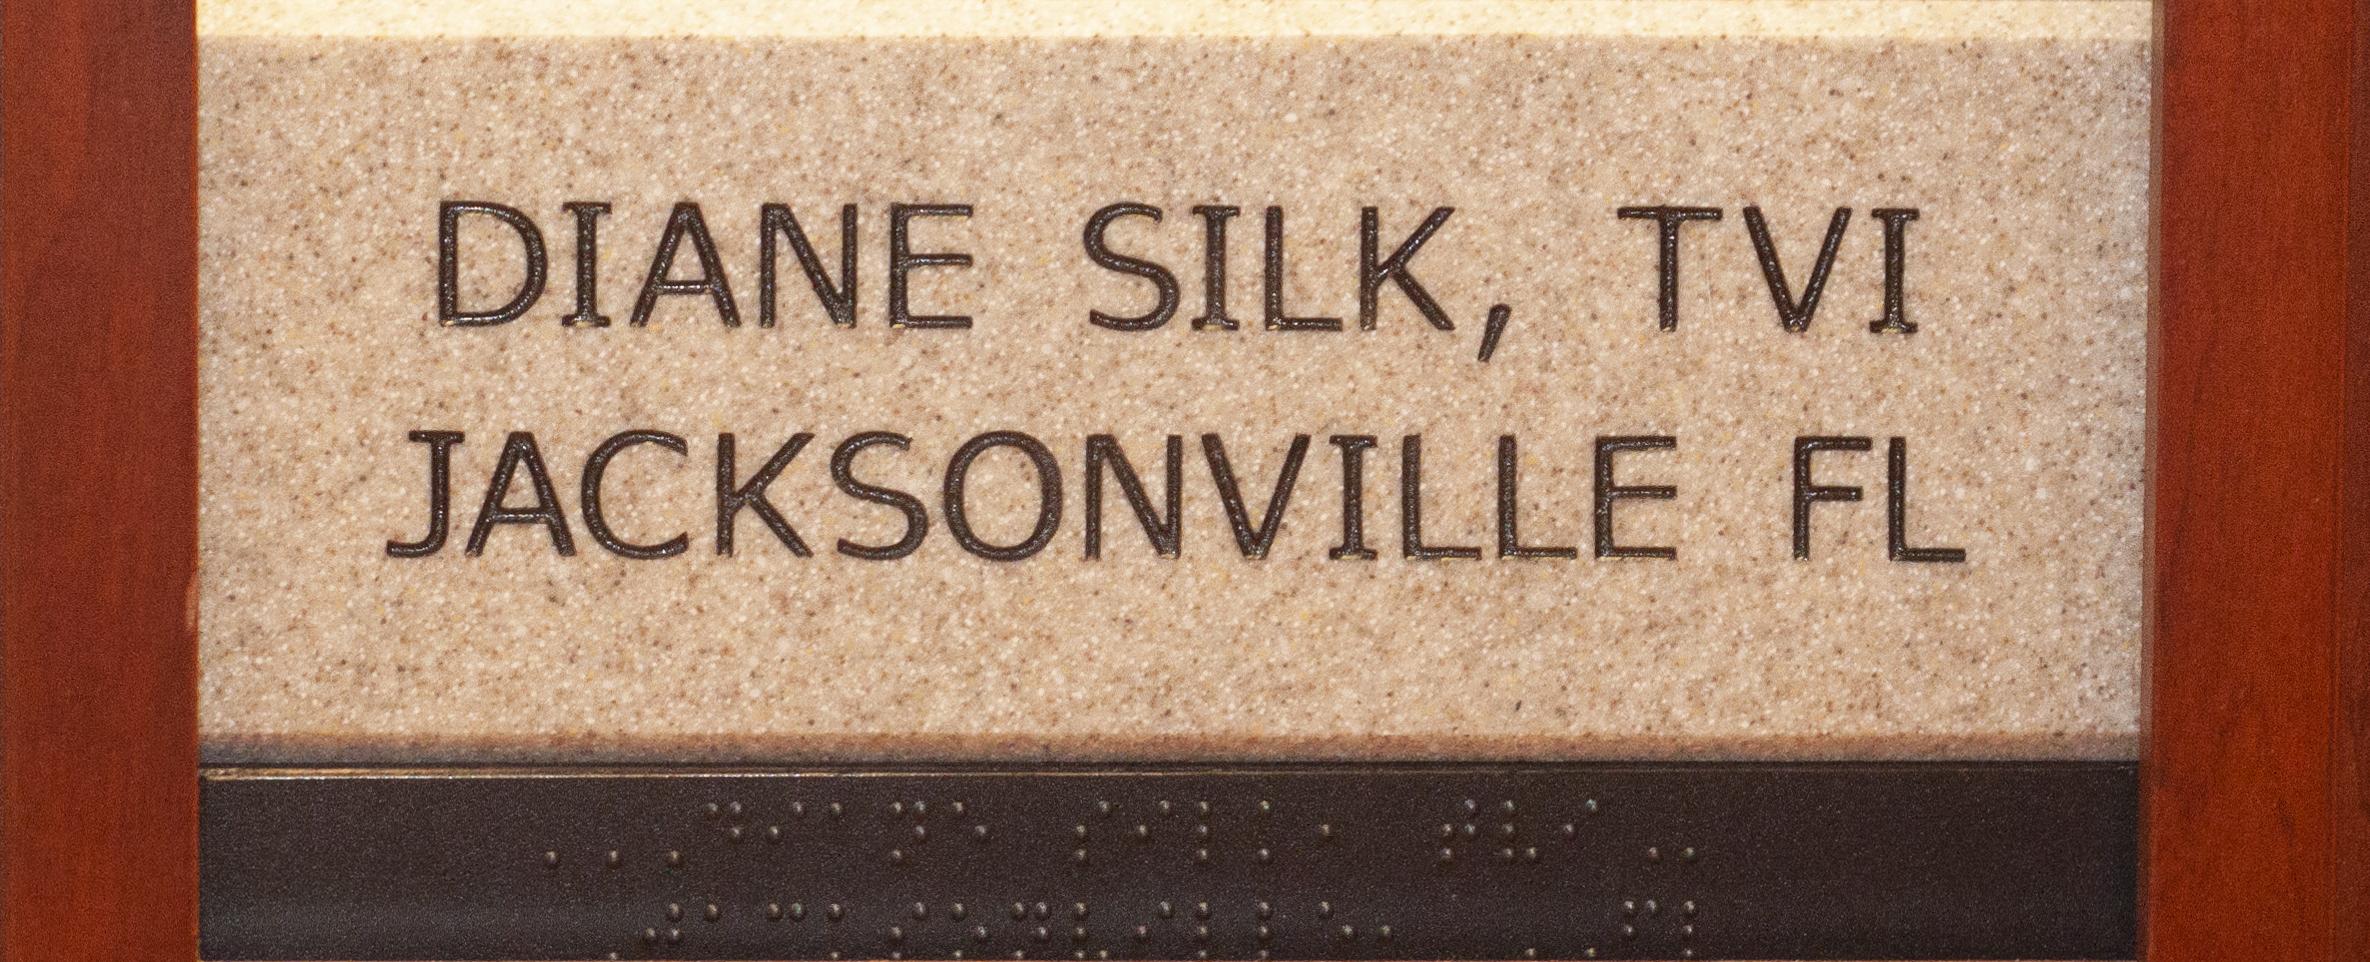 Diane Silk, TVI, Jacksonville FL